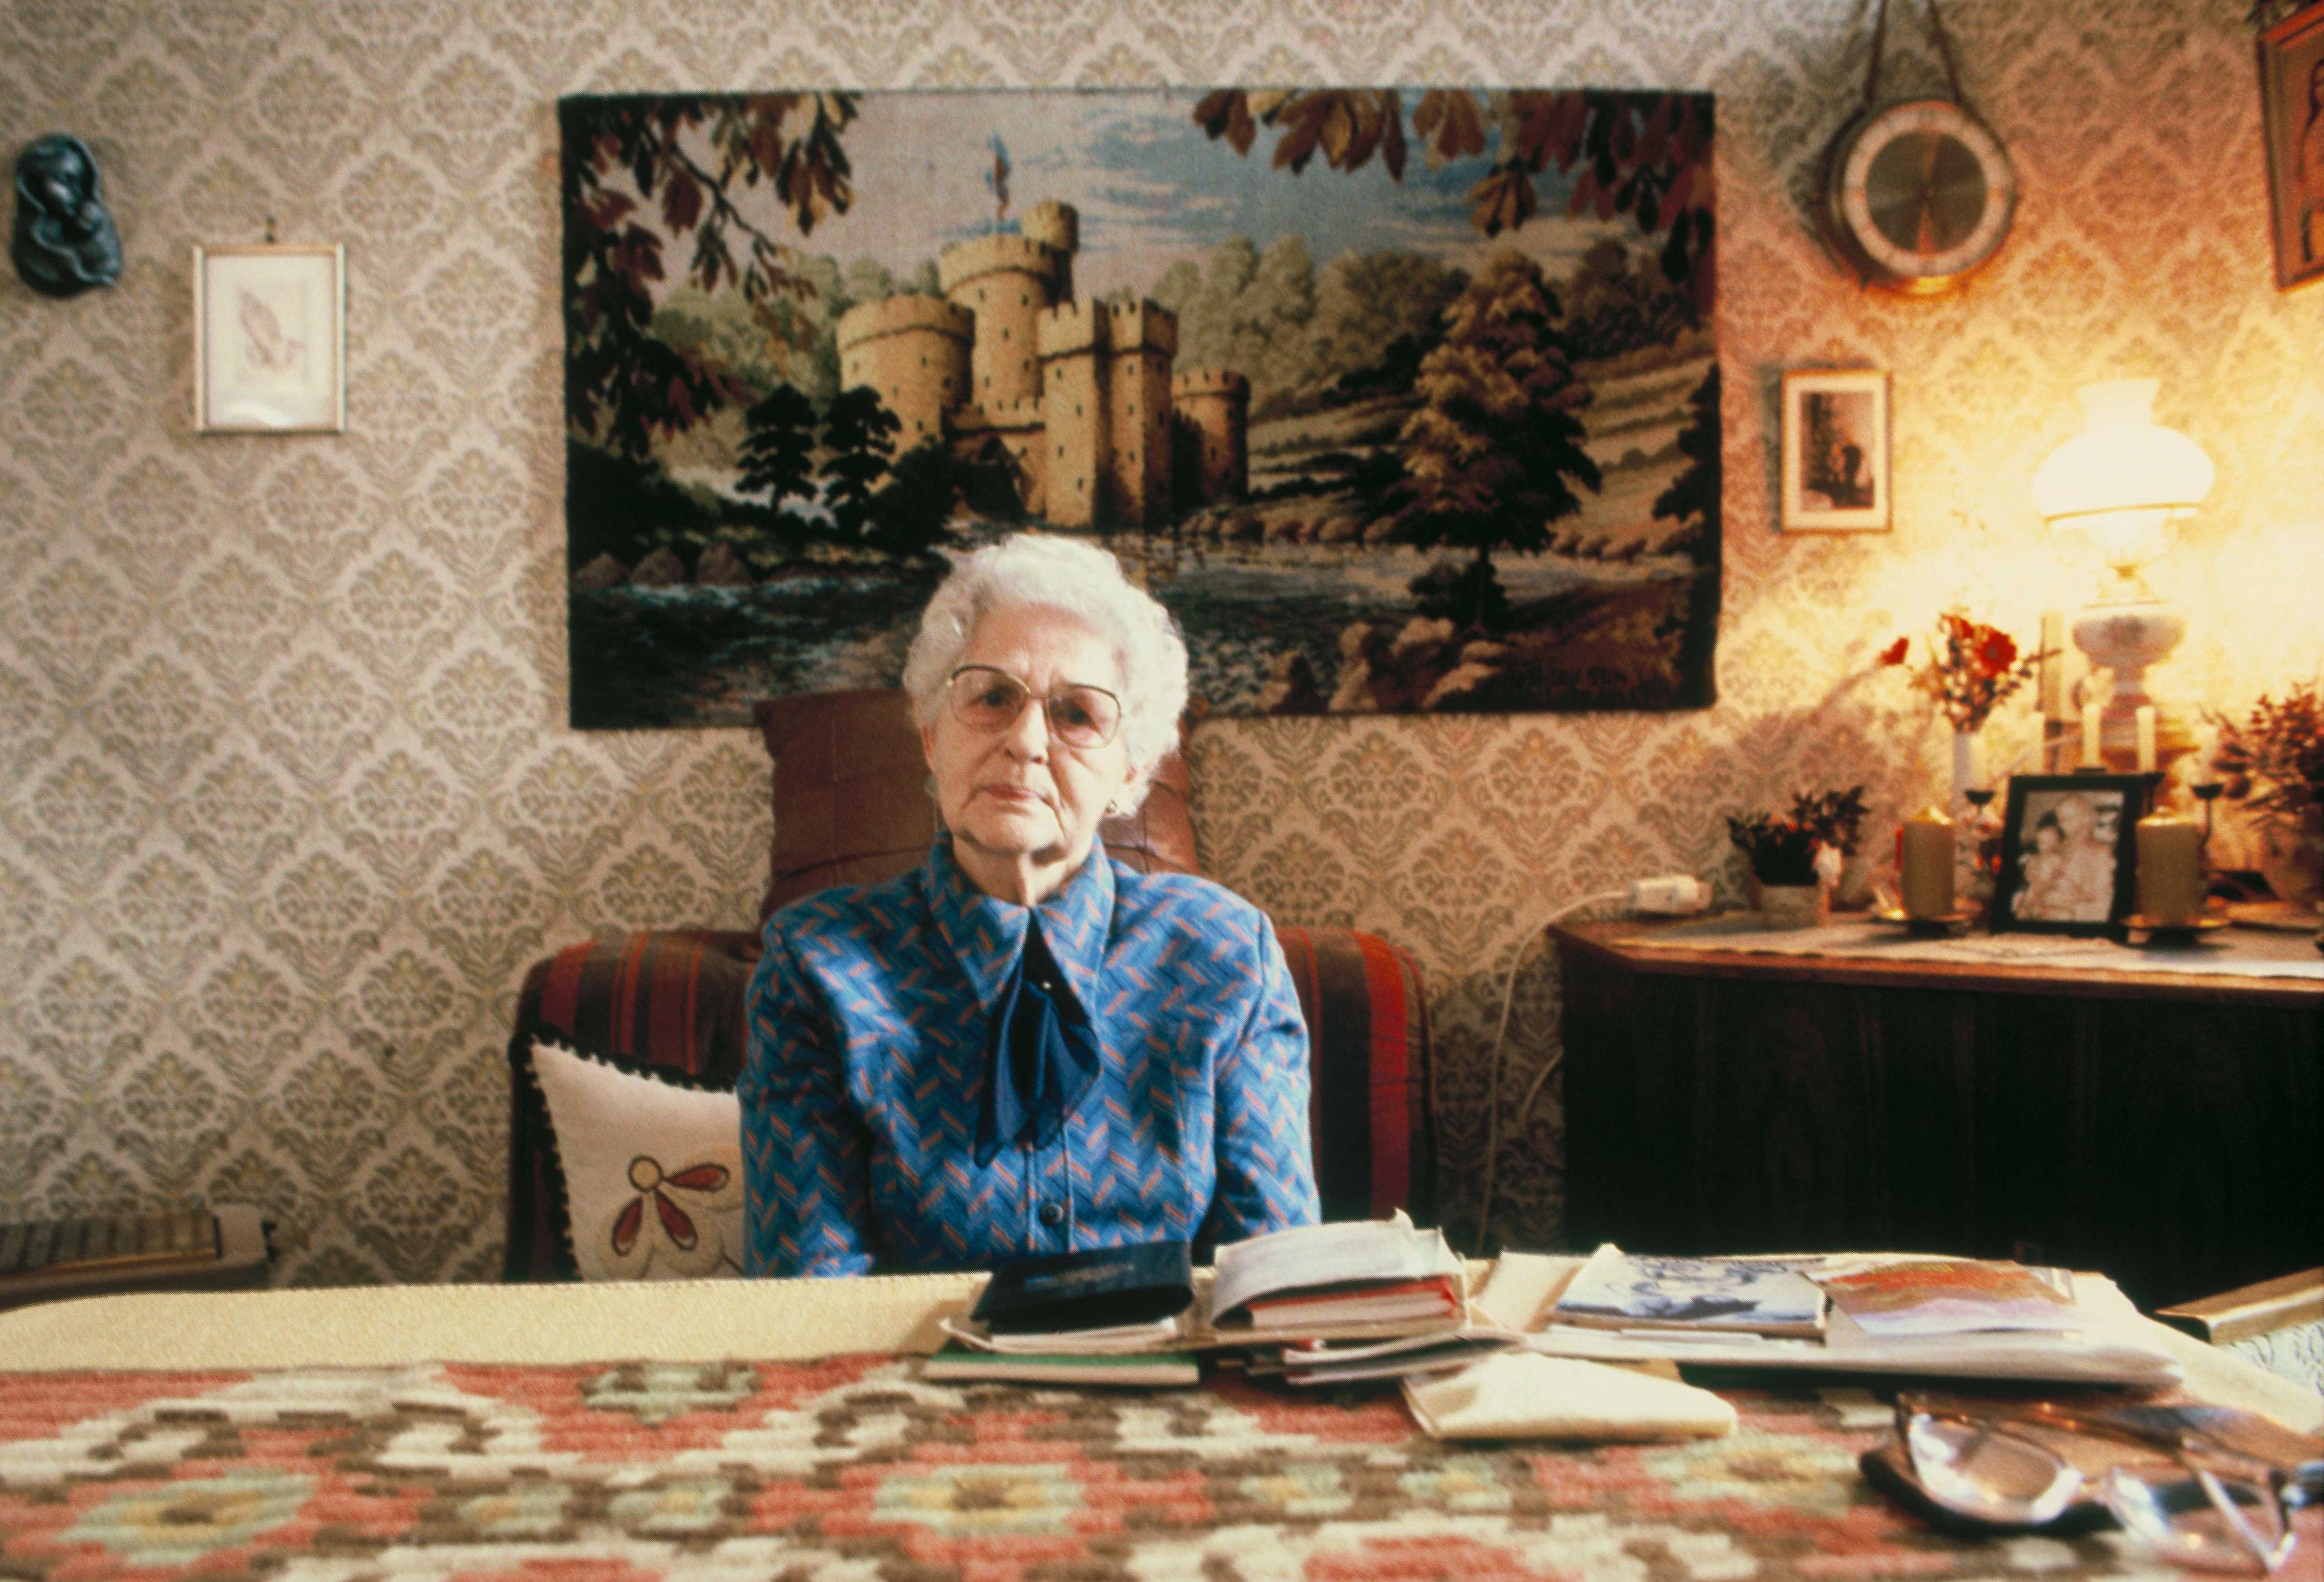 Anke Krey Nachbarn aus dem letzten Jahrhundert